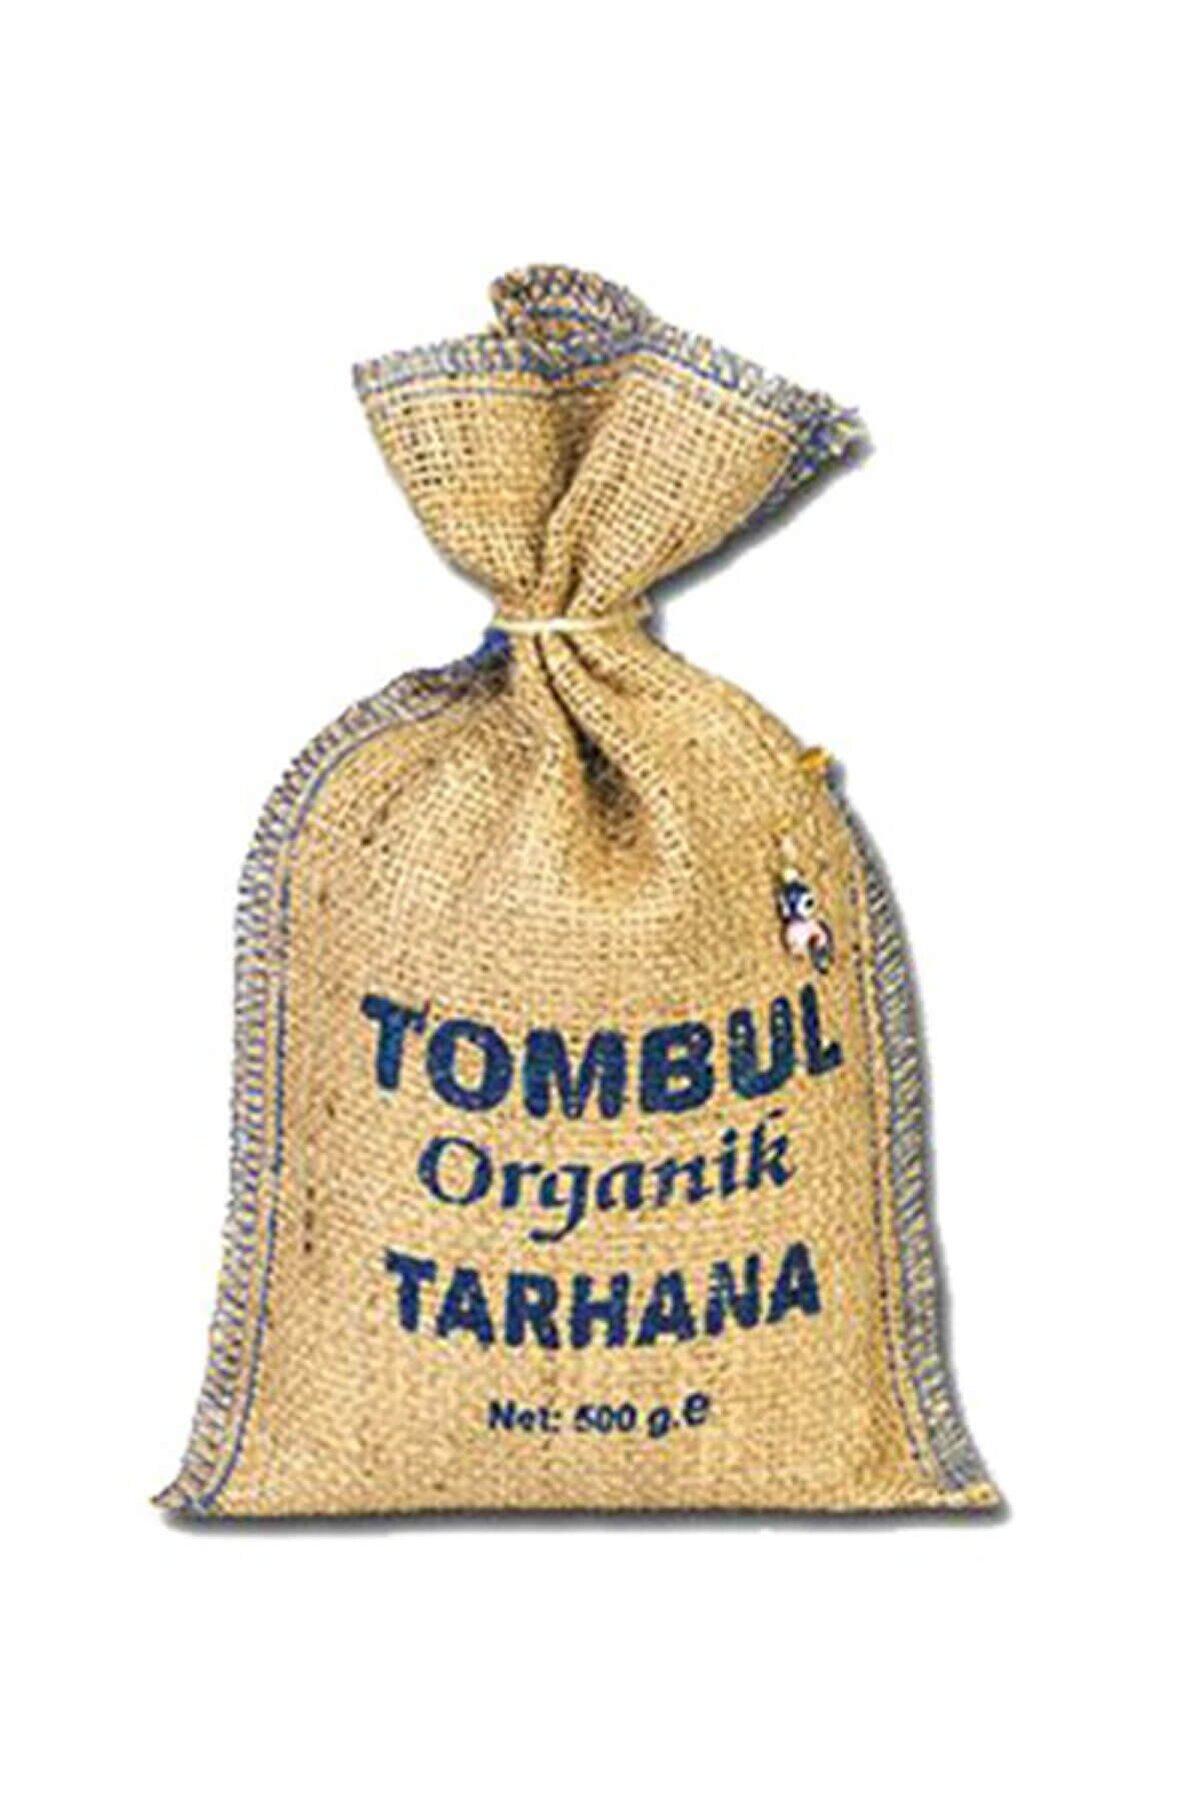 Tombul Tarhana Organik Tarhana Ev Yapımı 500 g